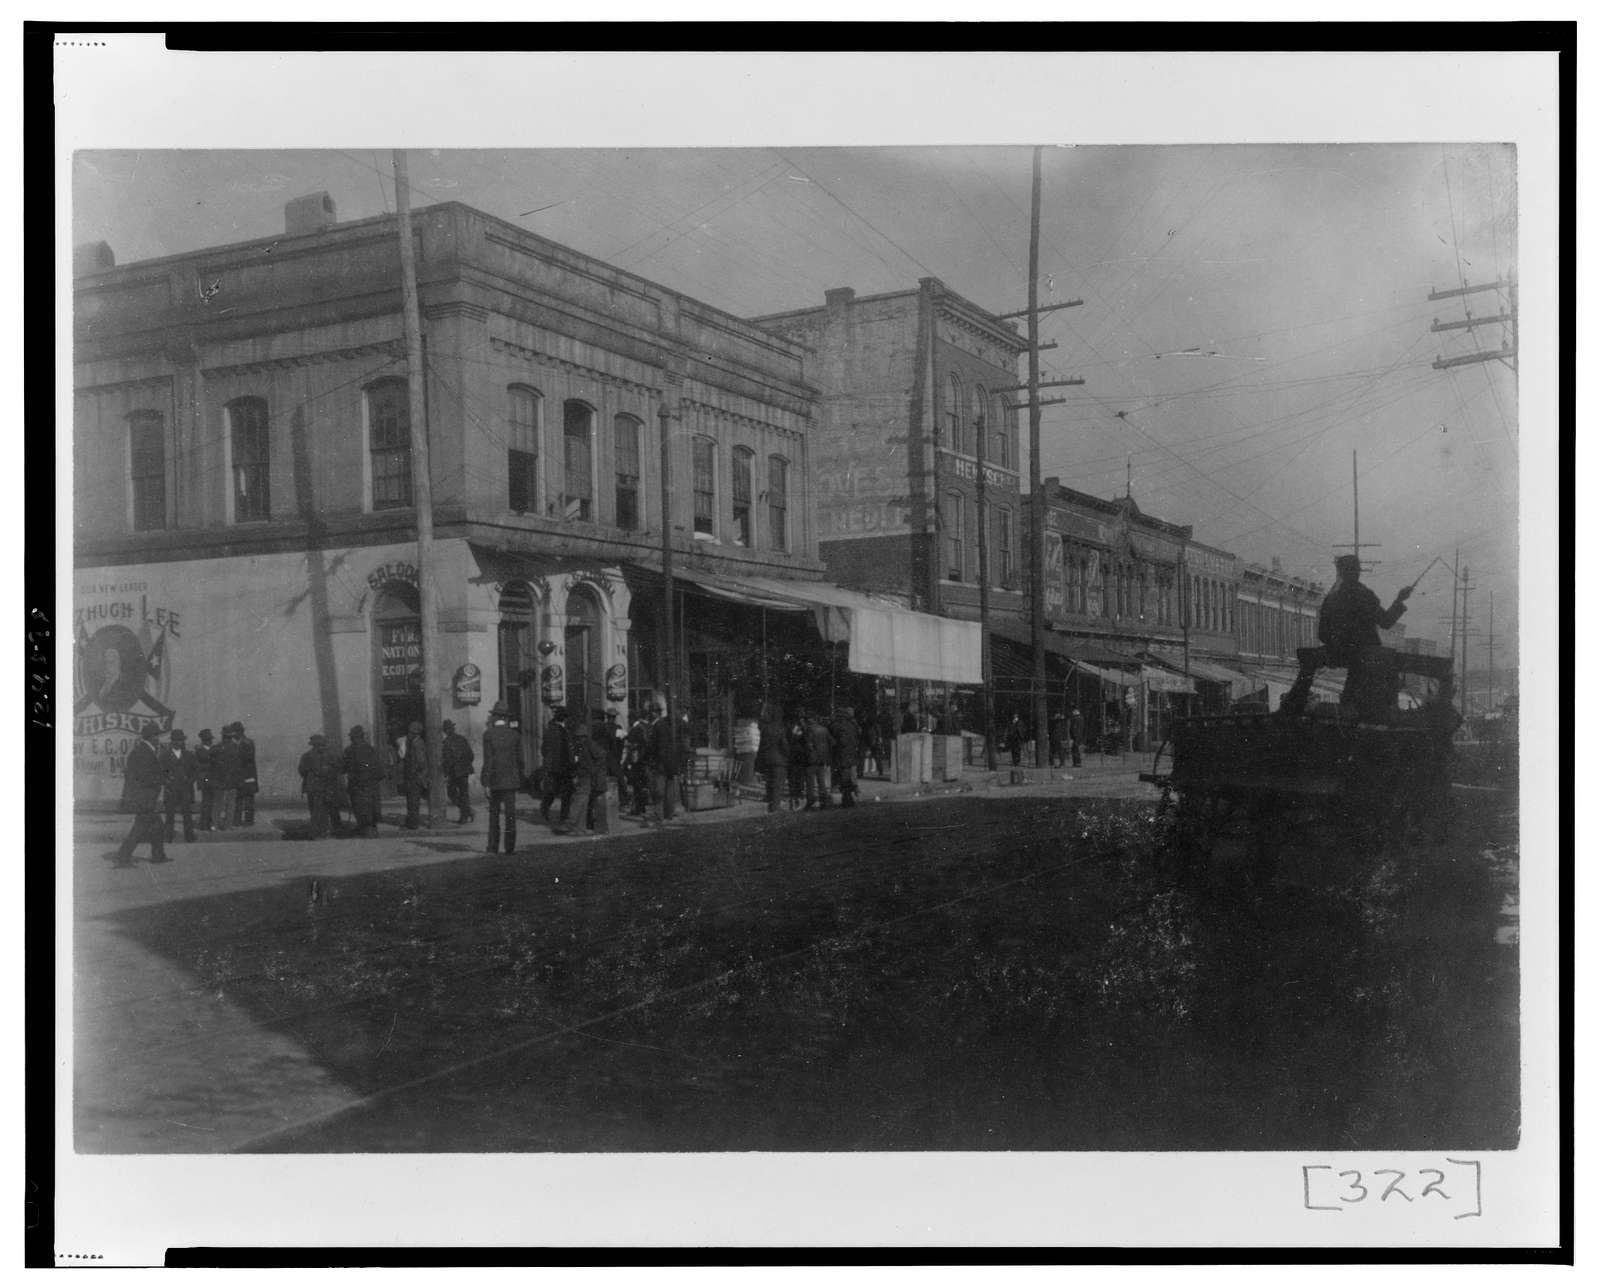 [Pedestrians on sidewalk along city street in Georgia]